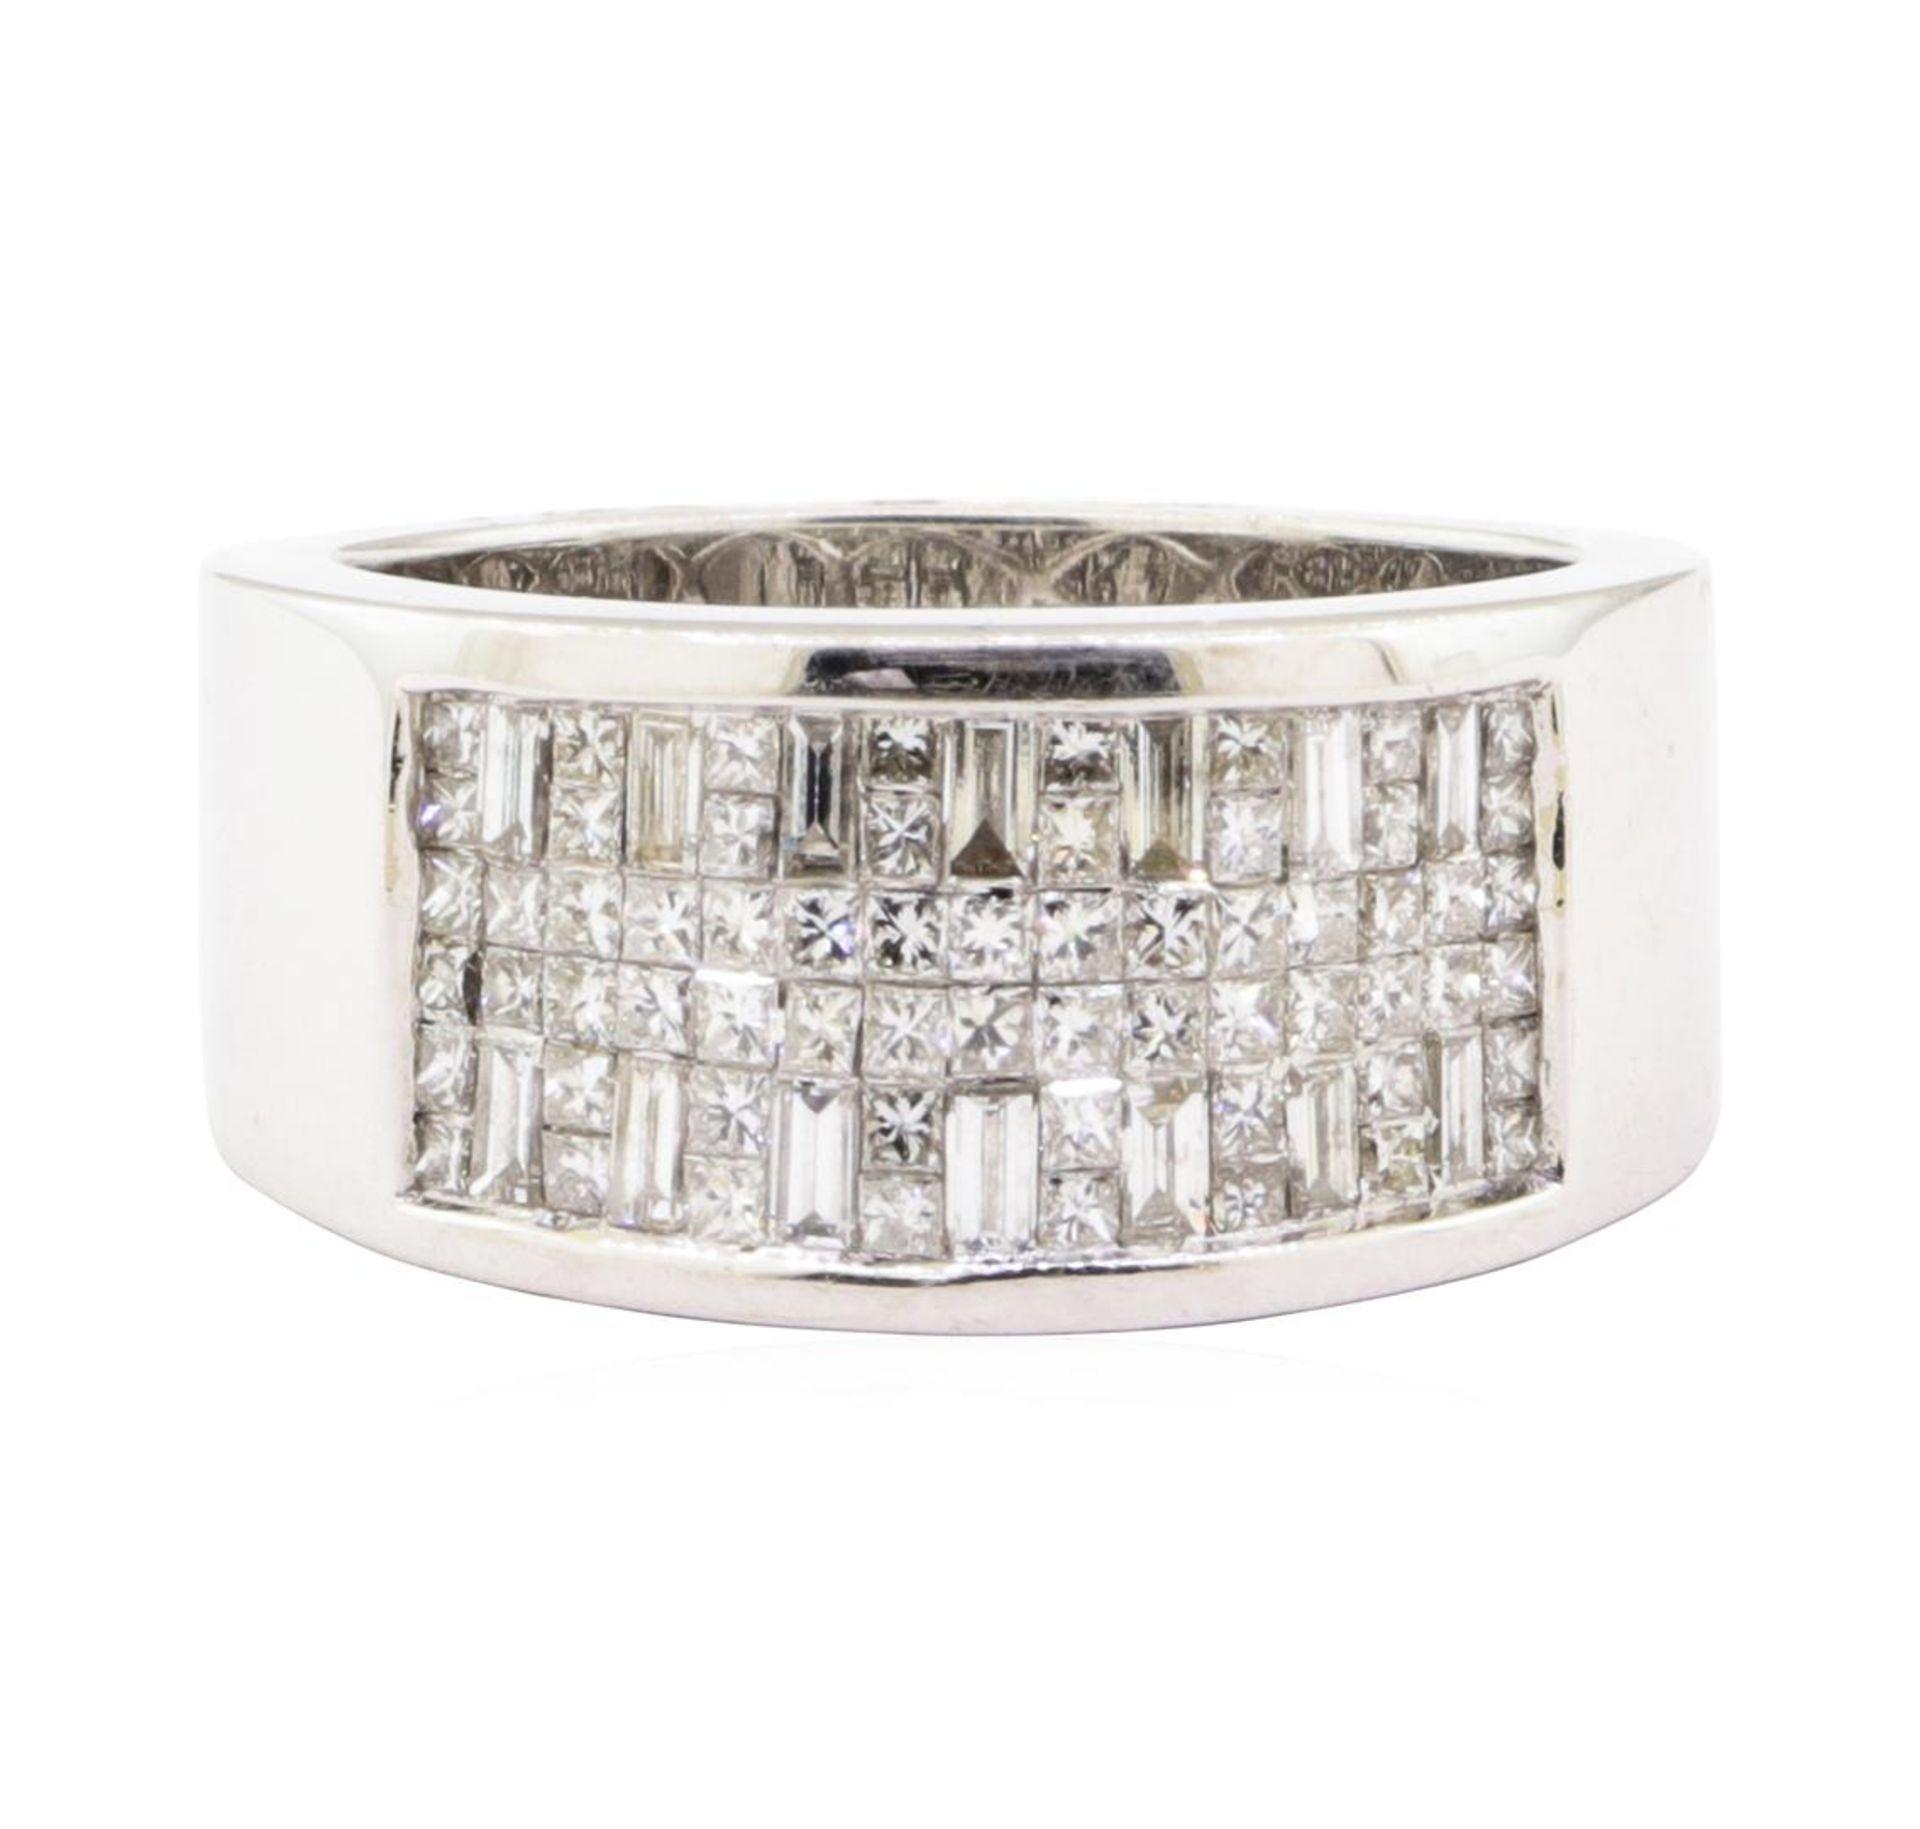 1.07 ctw Diamond Ring - 18KT White Gold - Image 2 of 4